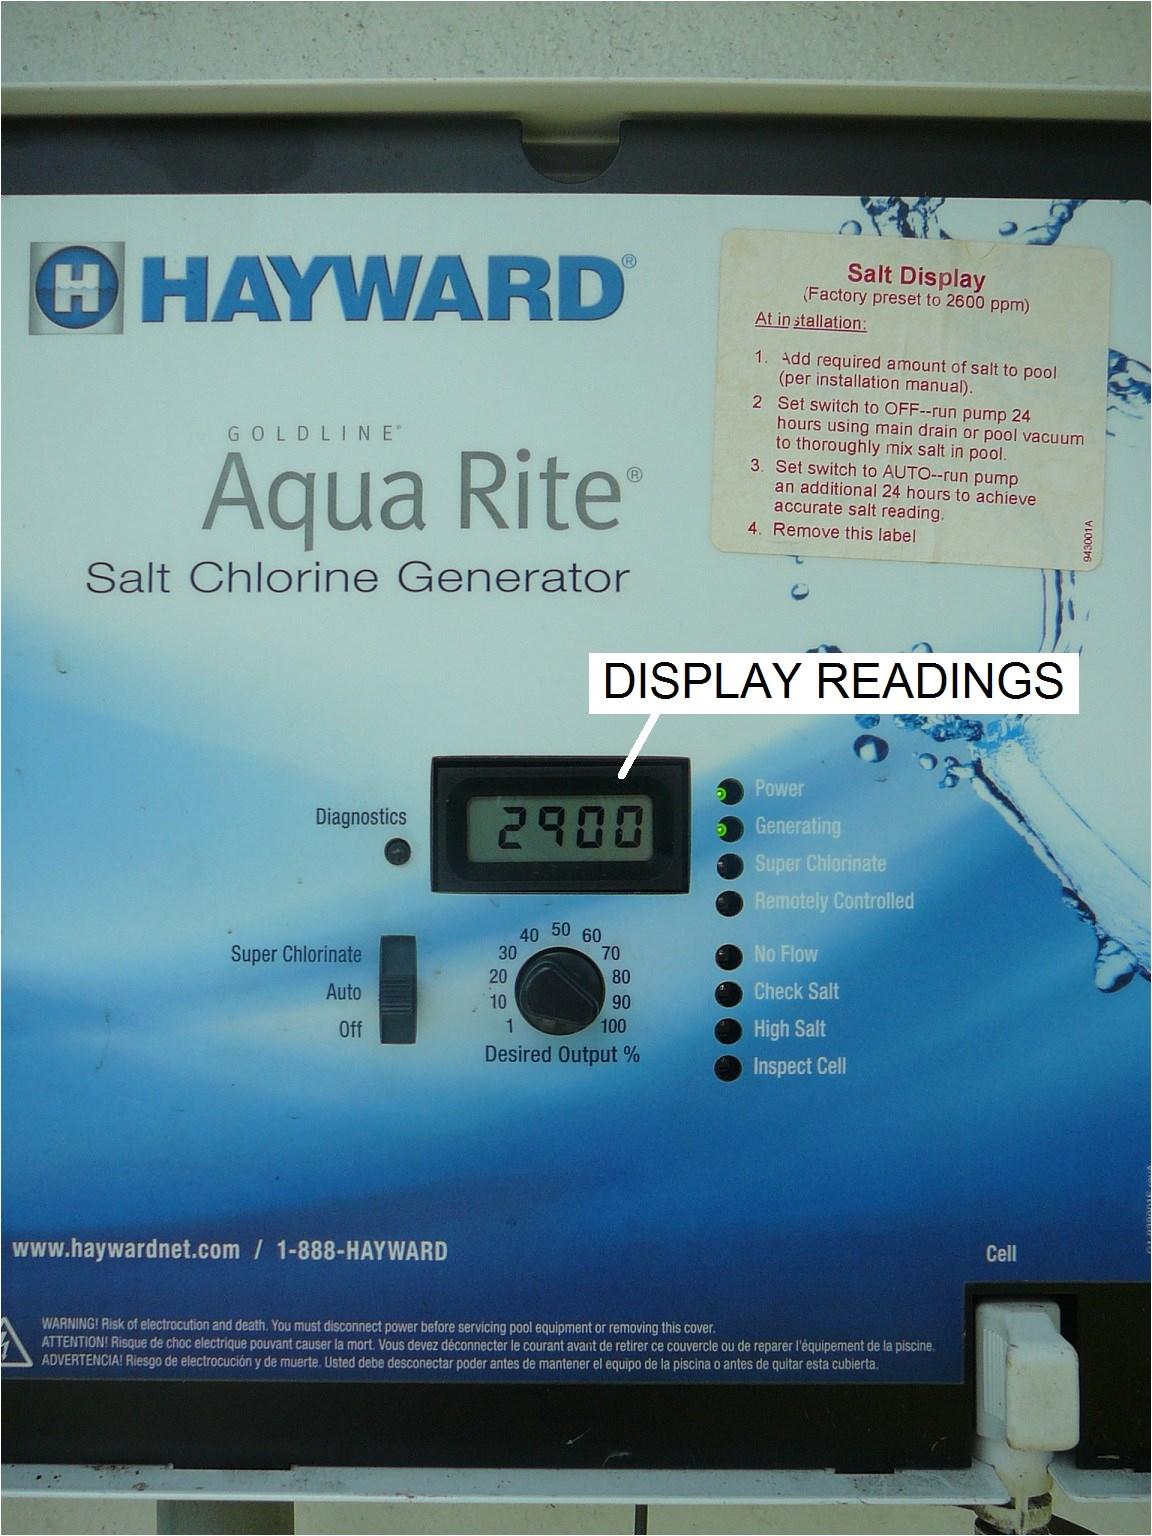 Hayward Aqua Rite Wiring Diagram How to Read and Adjust the Hayward Aqua Rite Scg Operational Values